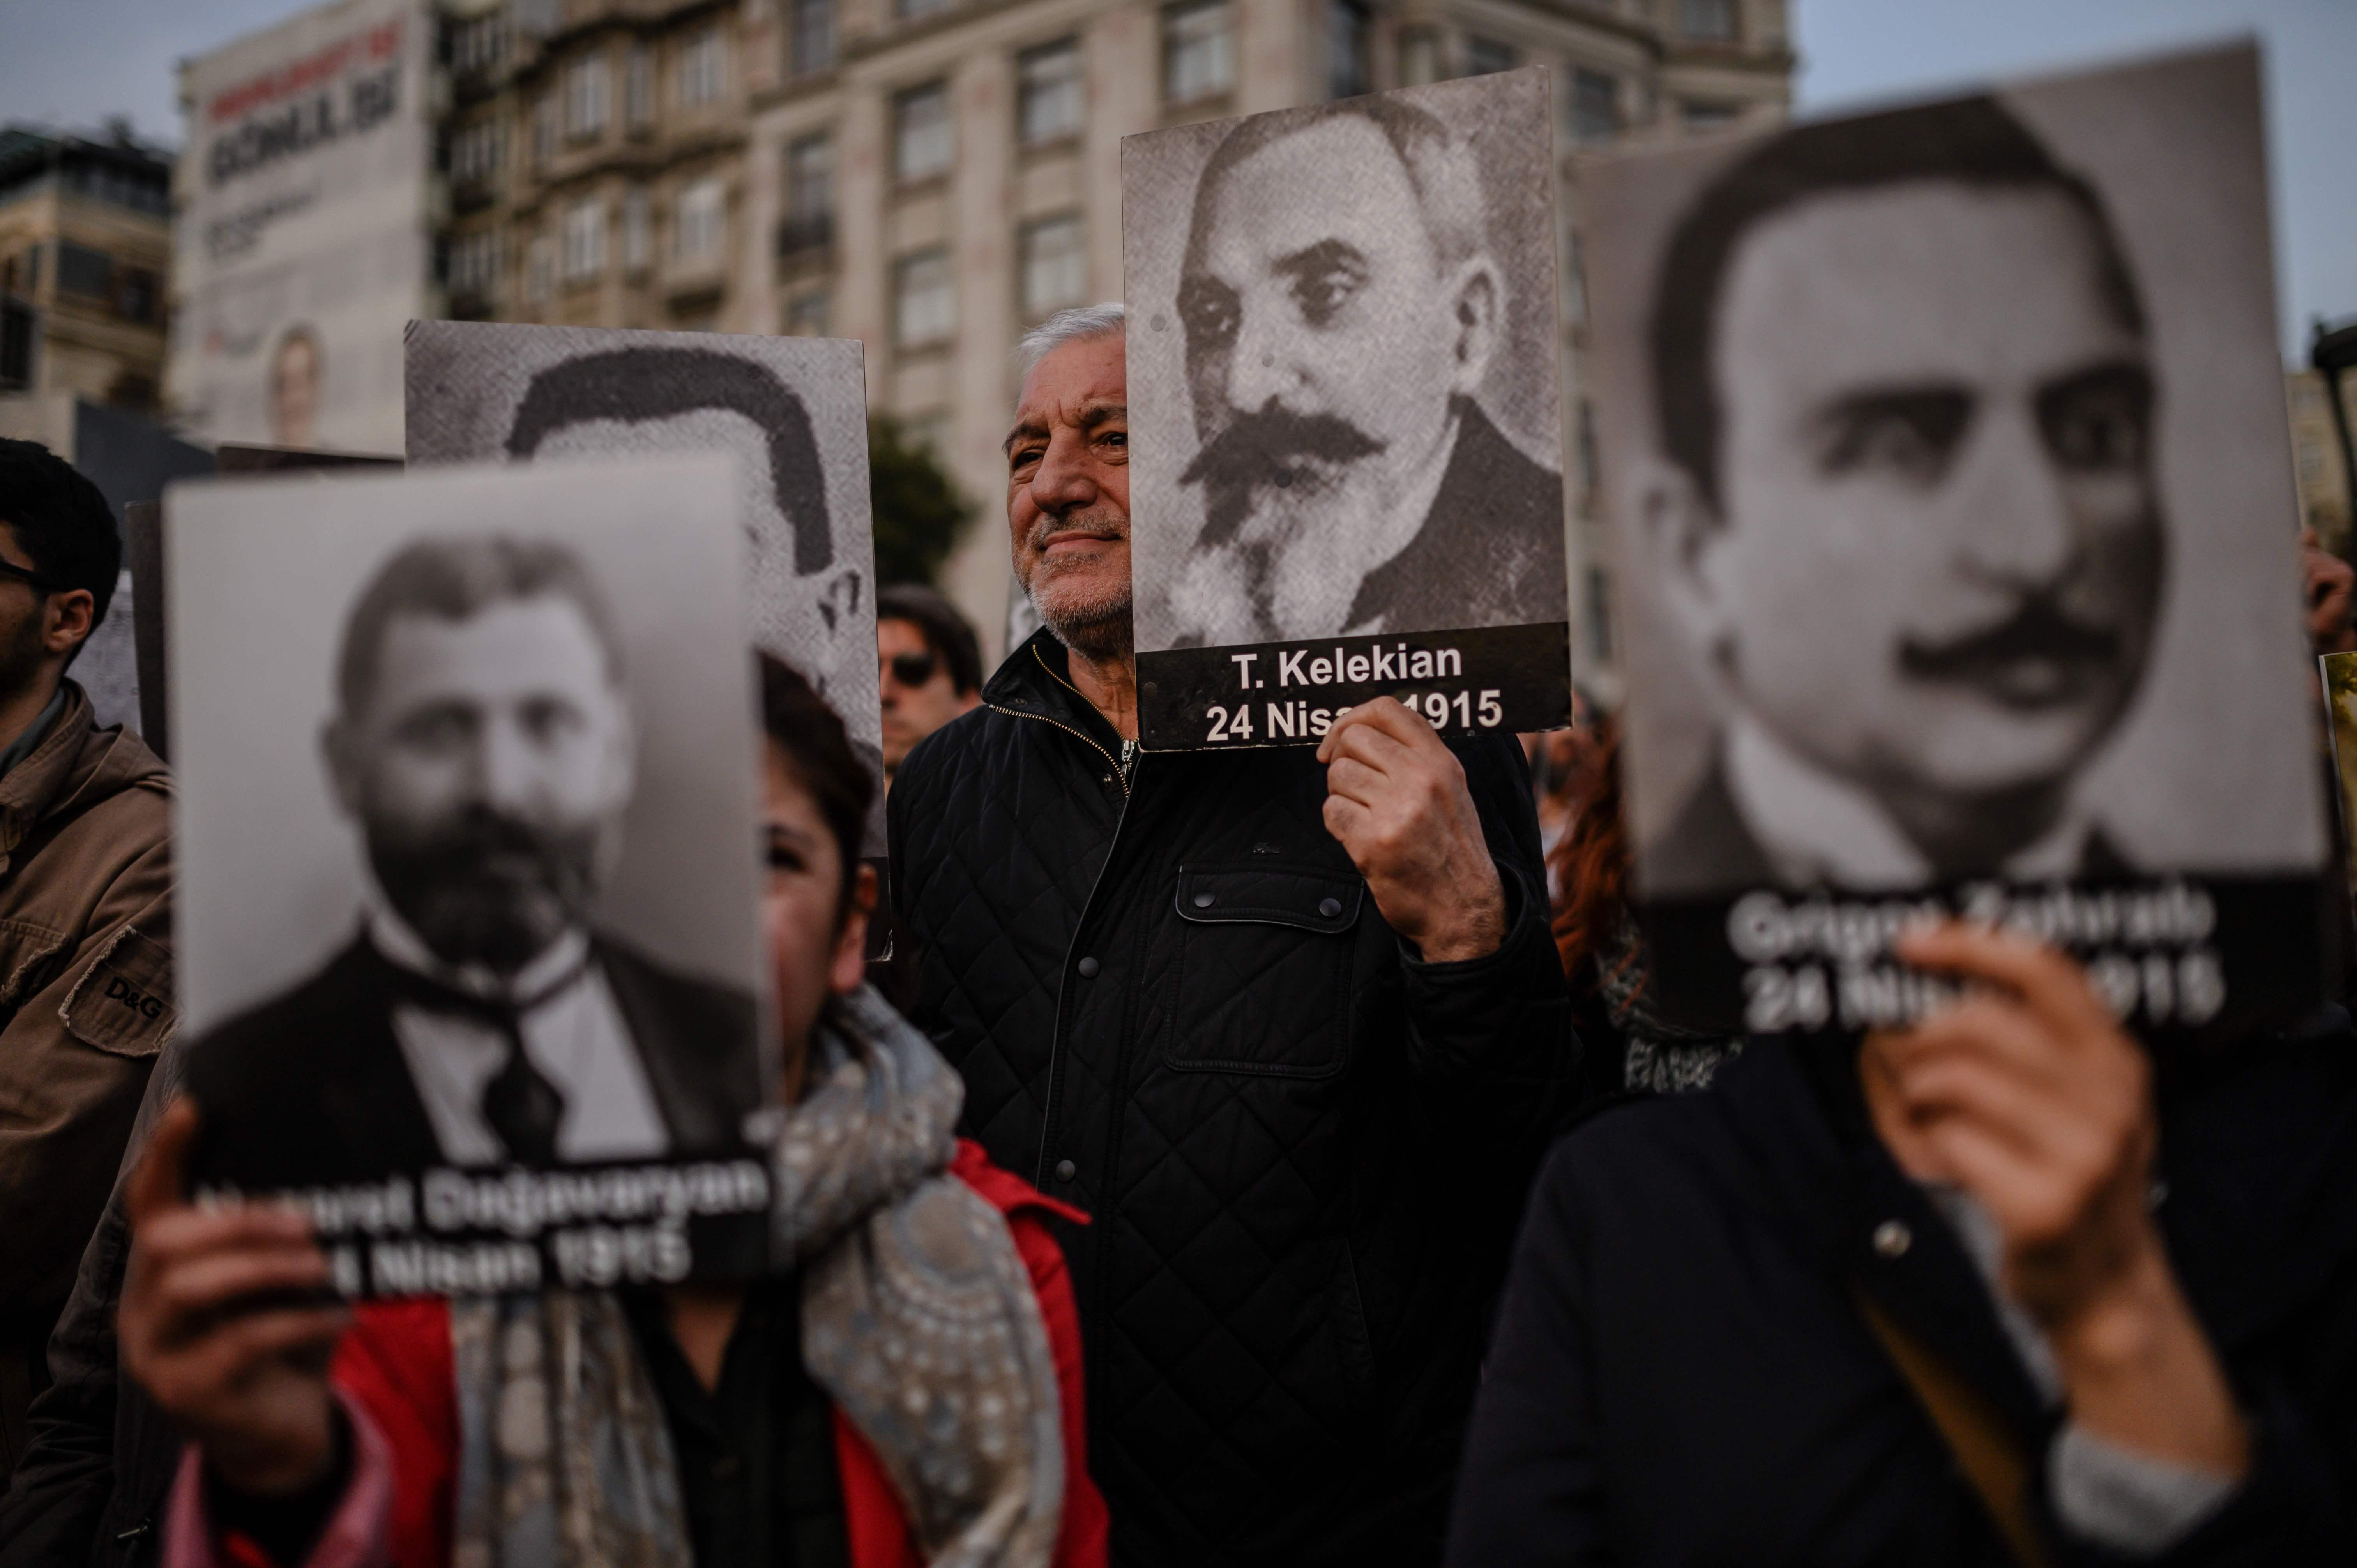 0d8d2201c أرمنيون يحملون صور ذويهم المفكرين ضحايا المذبحة خلال مسيرة فى إسطنبول  (أ.ف.ب)